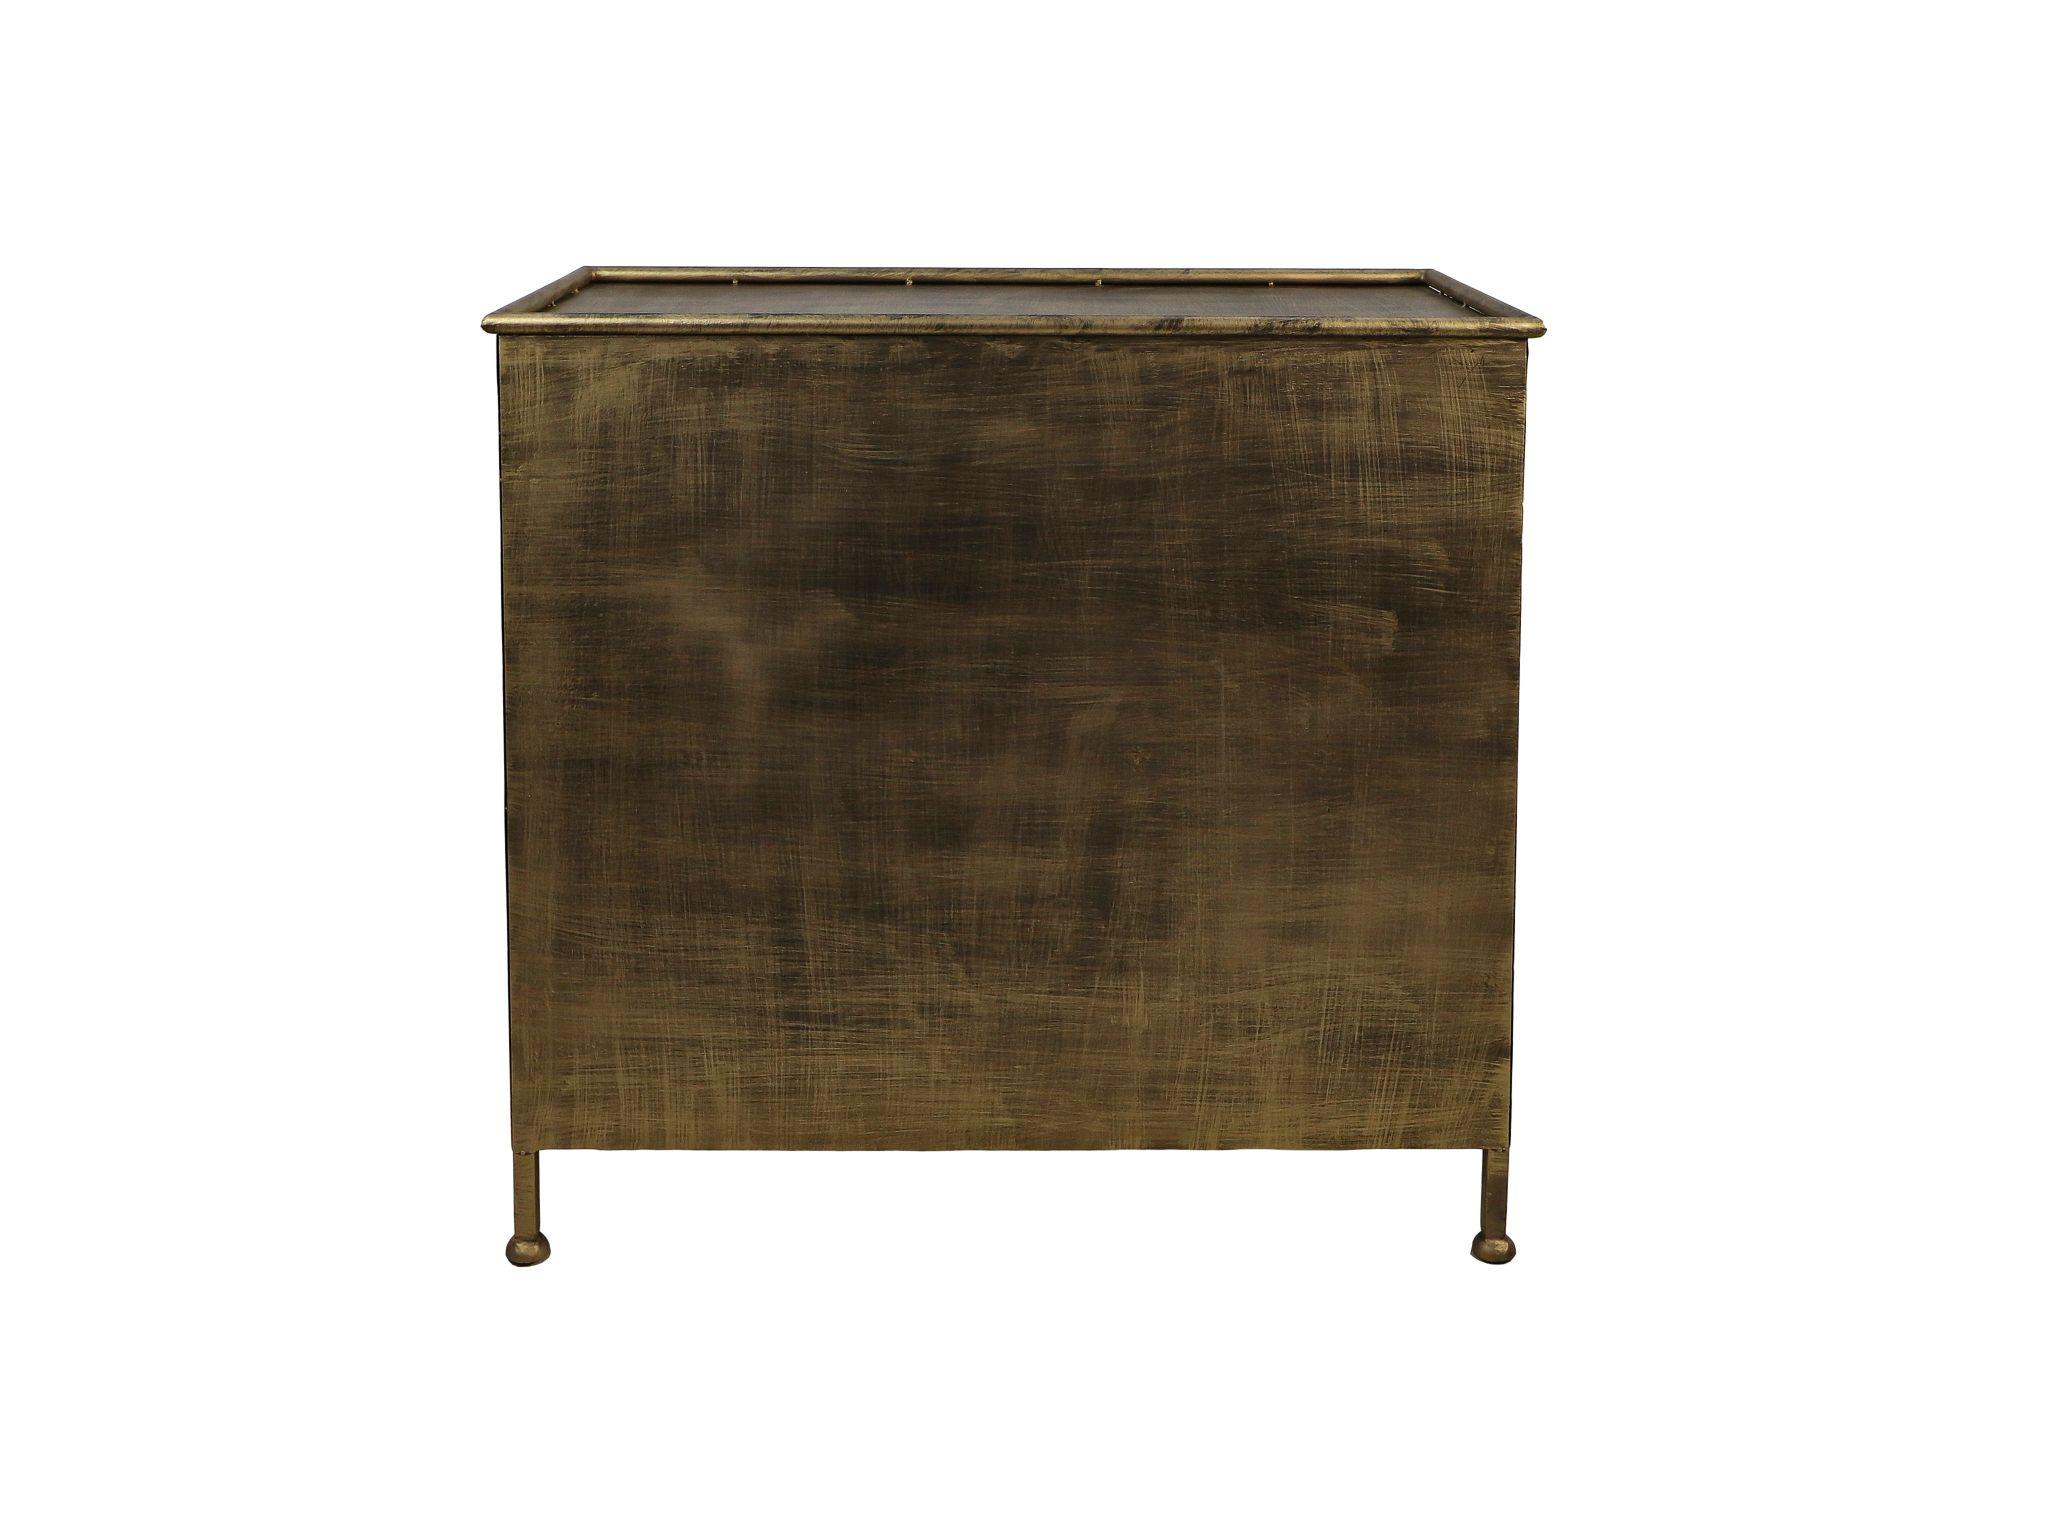 Vitrinekastje Fletcher - 93x42x90 - Antique Gold - Metaal/glas